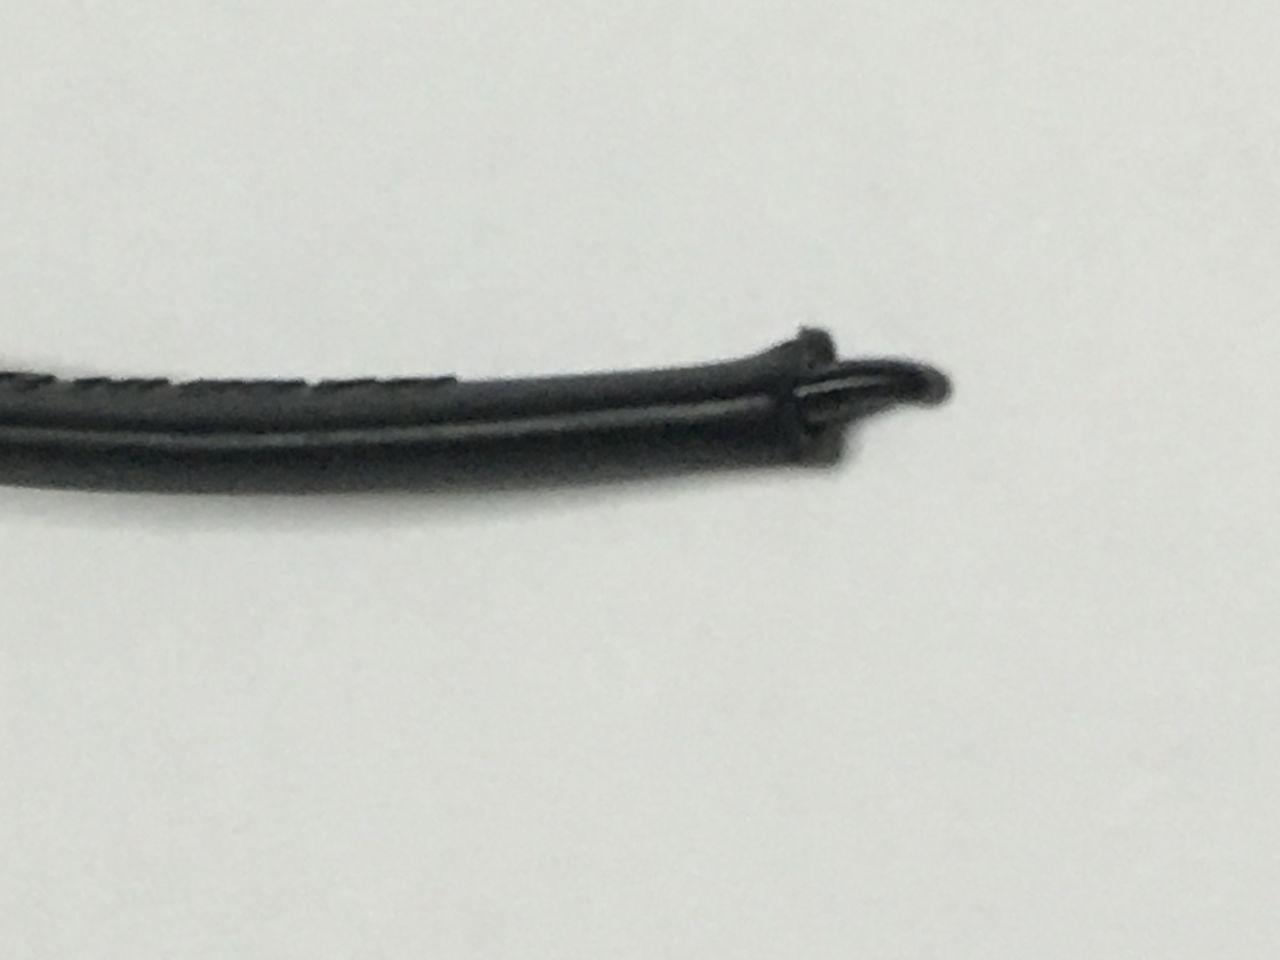 FS: Xsquared, Carbon frame OOBIP sku oo6011-08, Badman Plasma frame with Sapphire lenses - IMG_1379.jpg